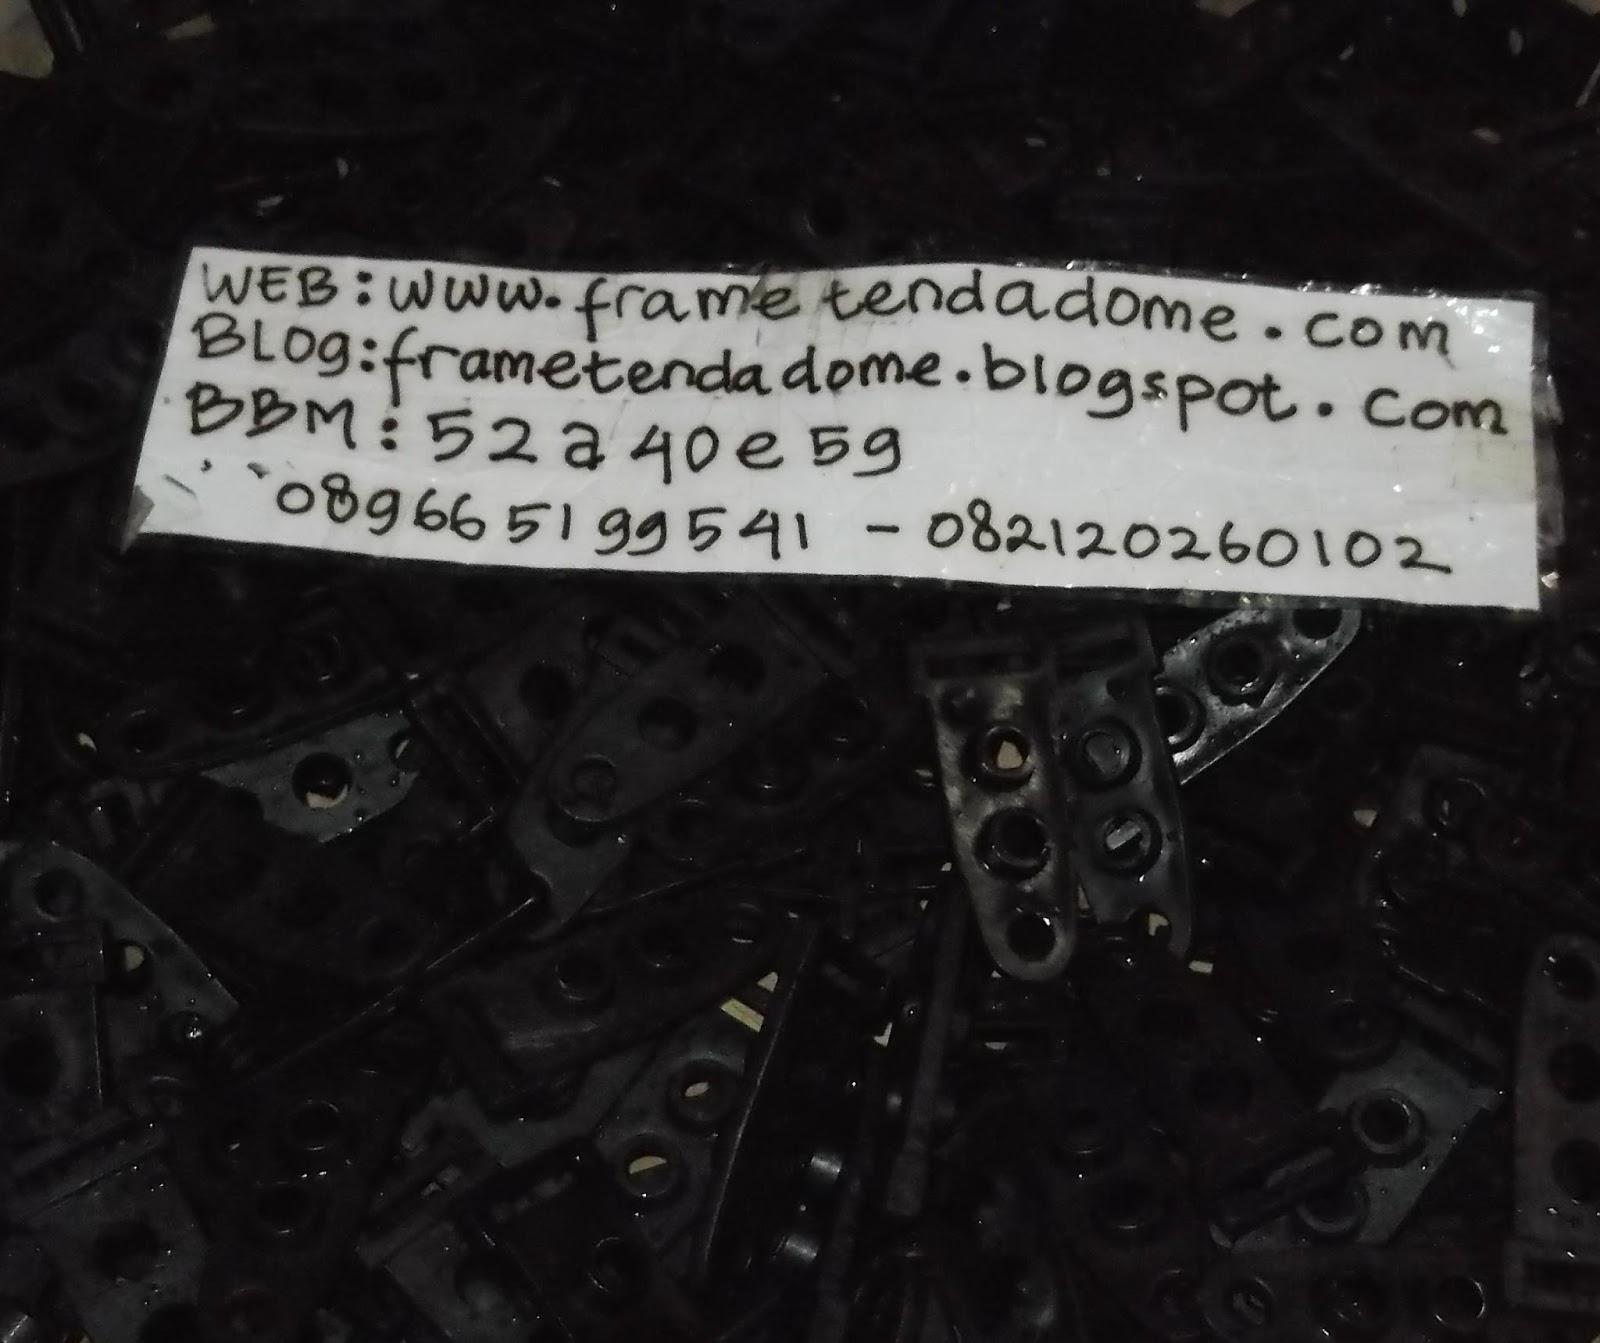 Pabrik Frame Tenda Dome Sejak 1980 Bandung Pengait Whatsapp Telephone Sms 082120260102